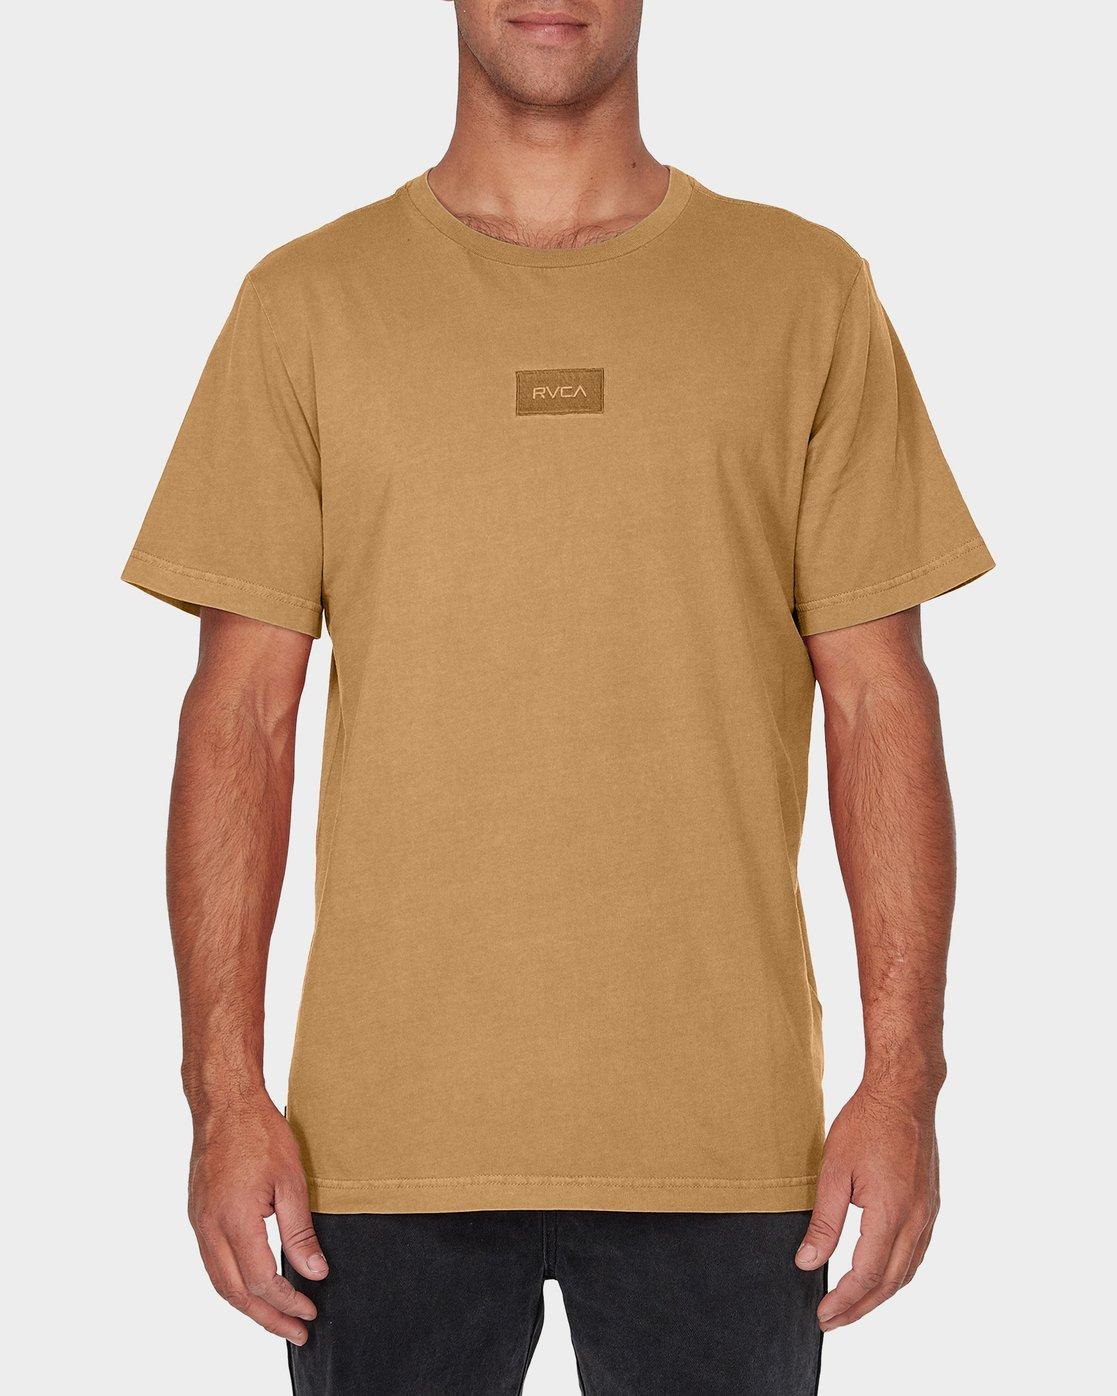 0 RVCA Focus T-Shirt Green R181061 RVCA